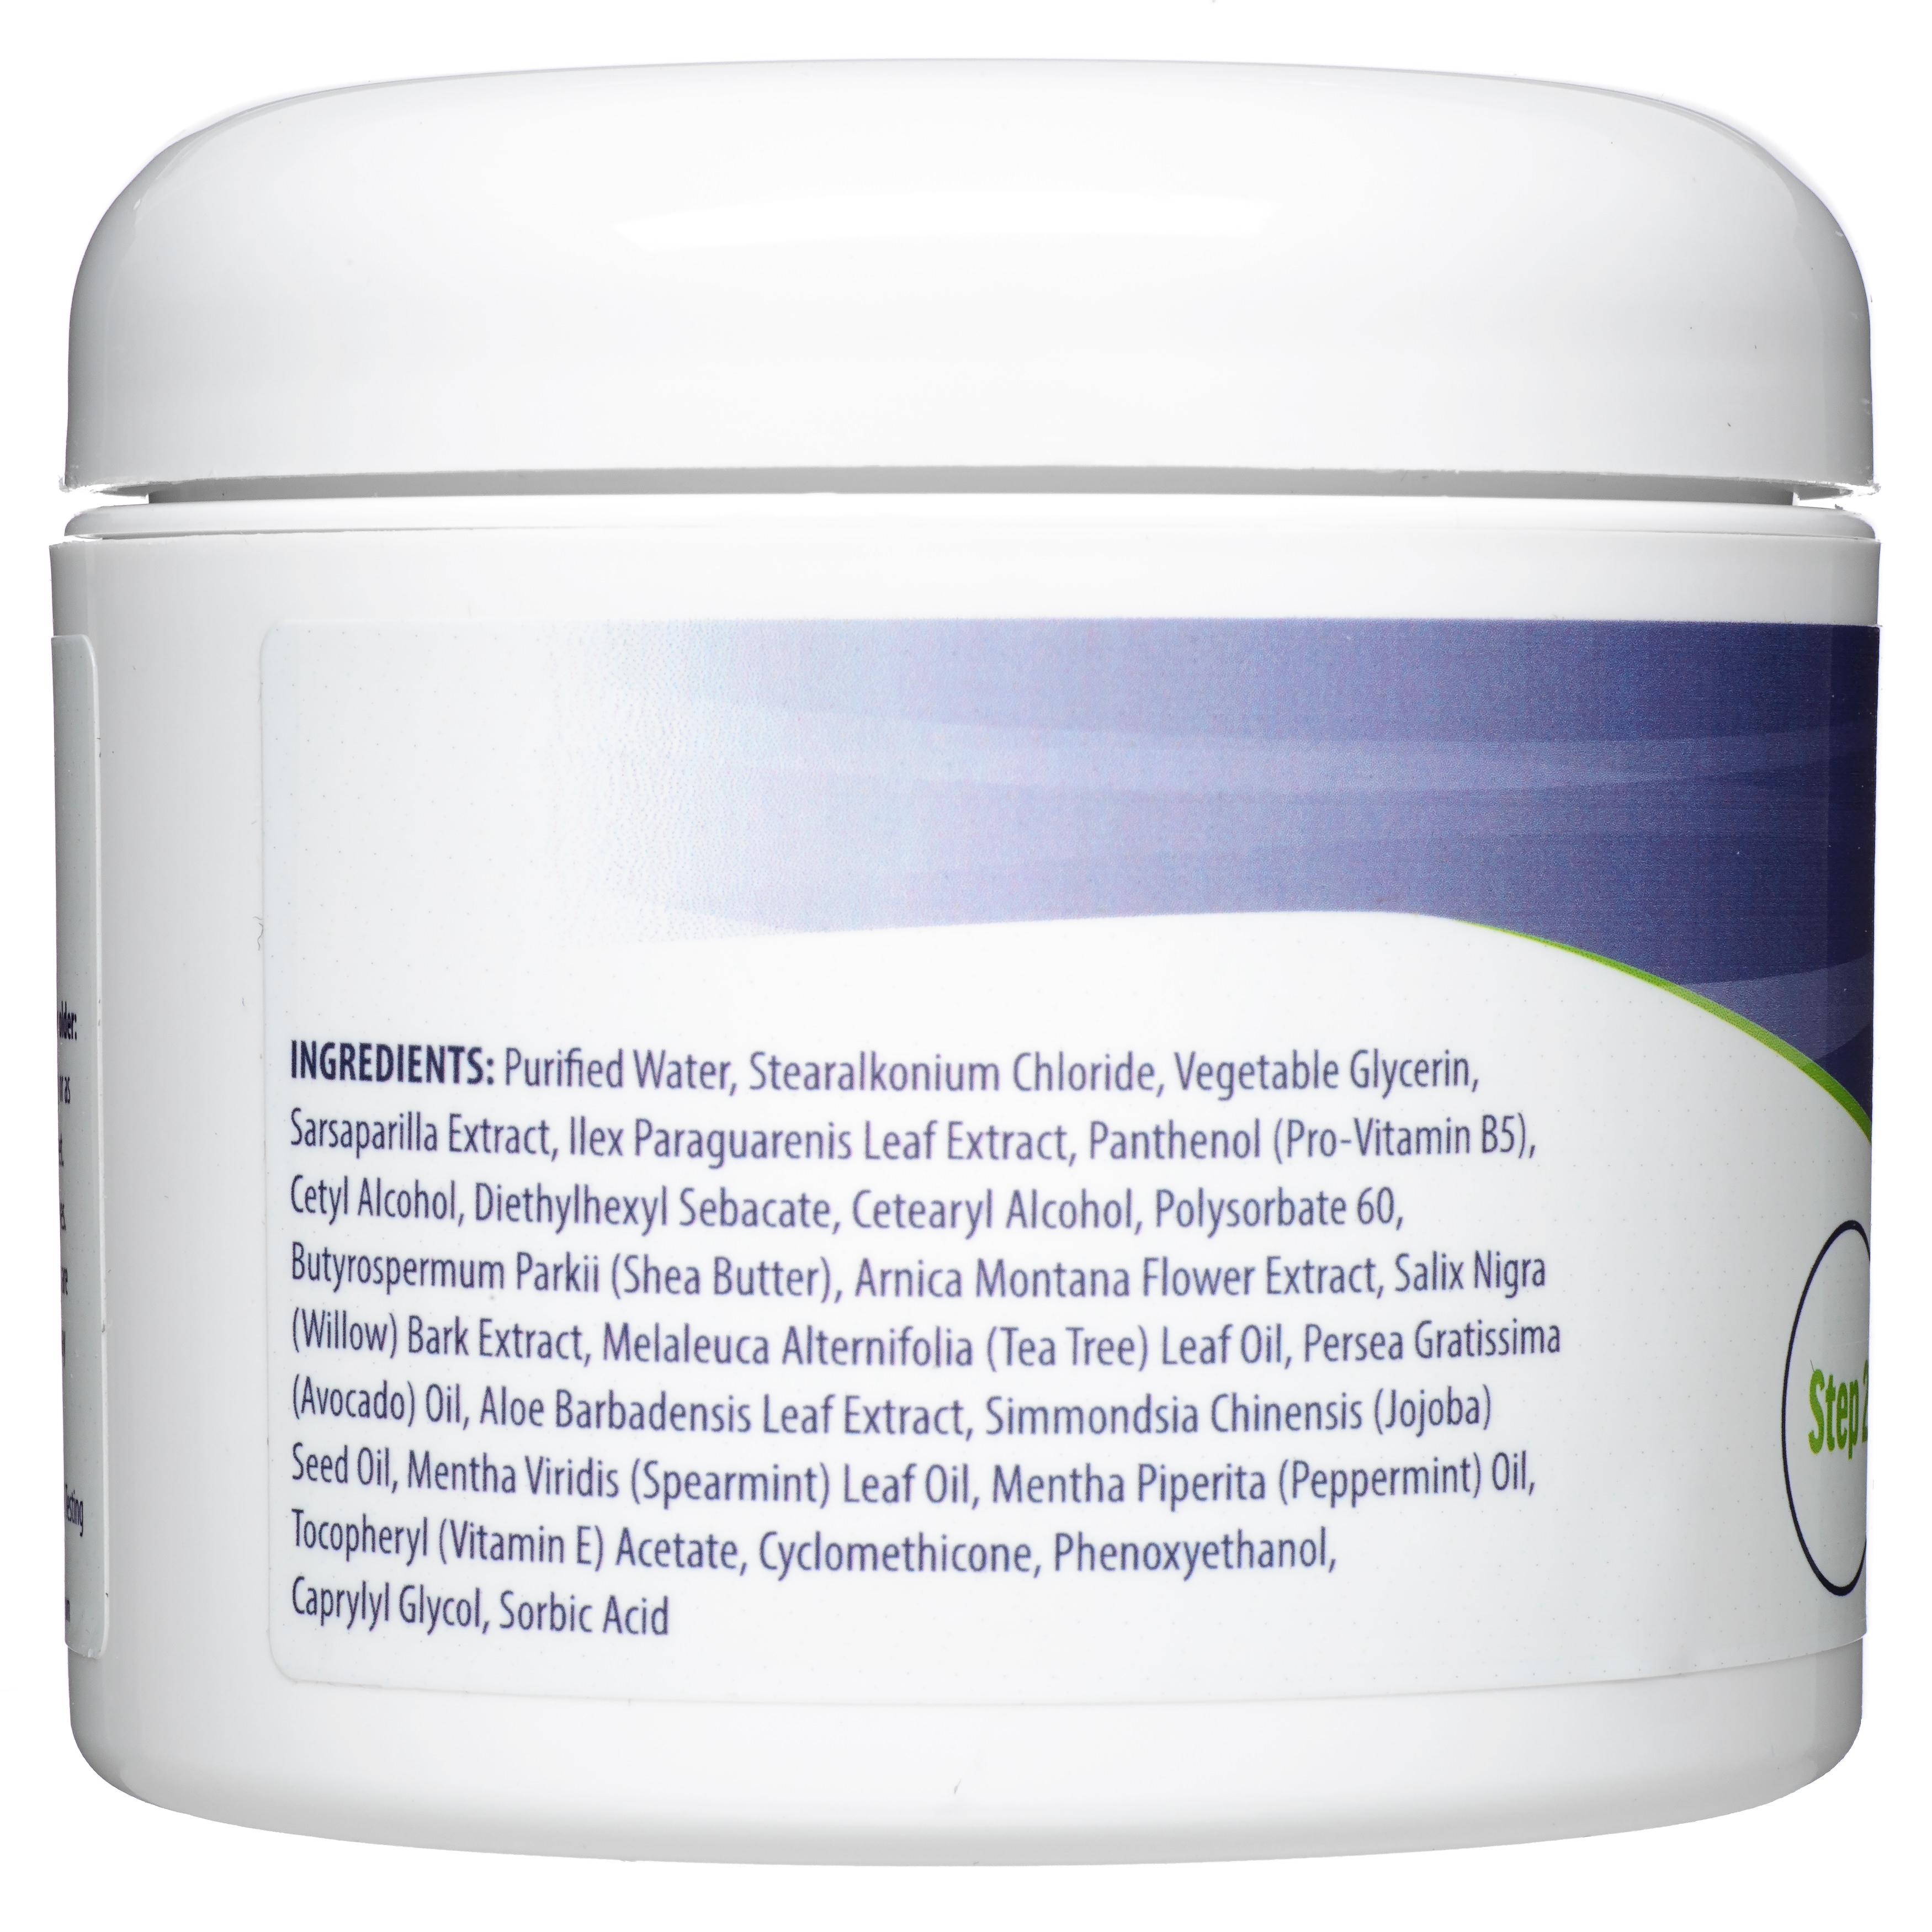 Bunion Balm Night Formulation Label Ingredients